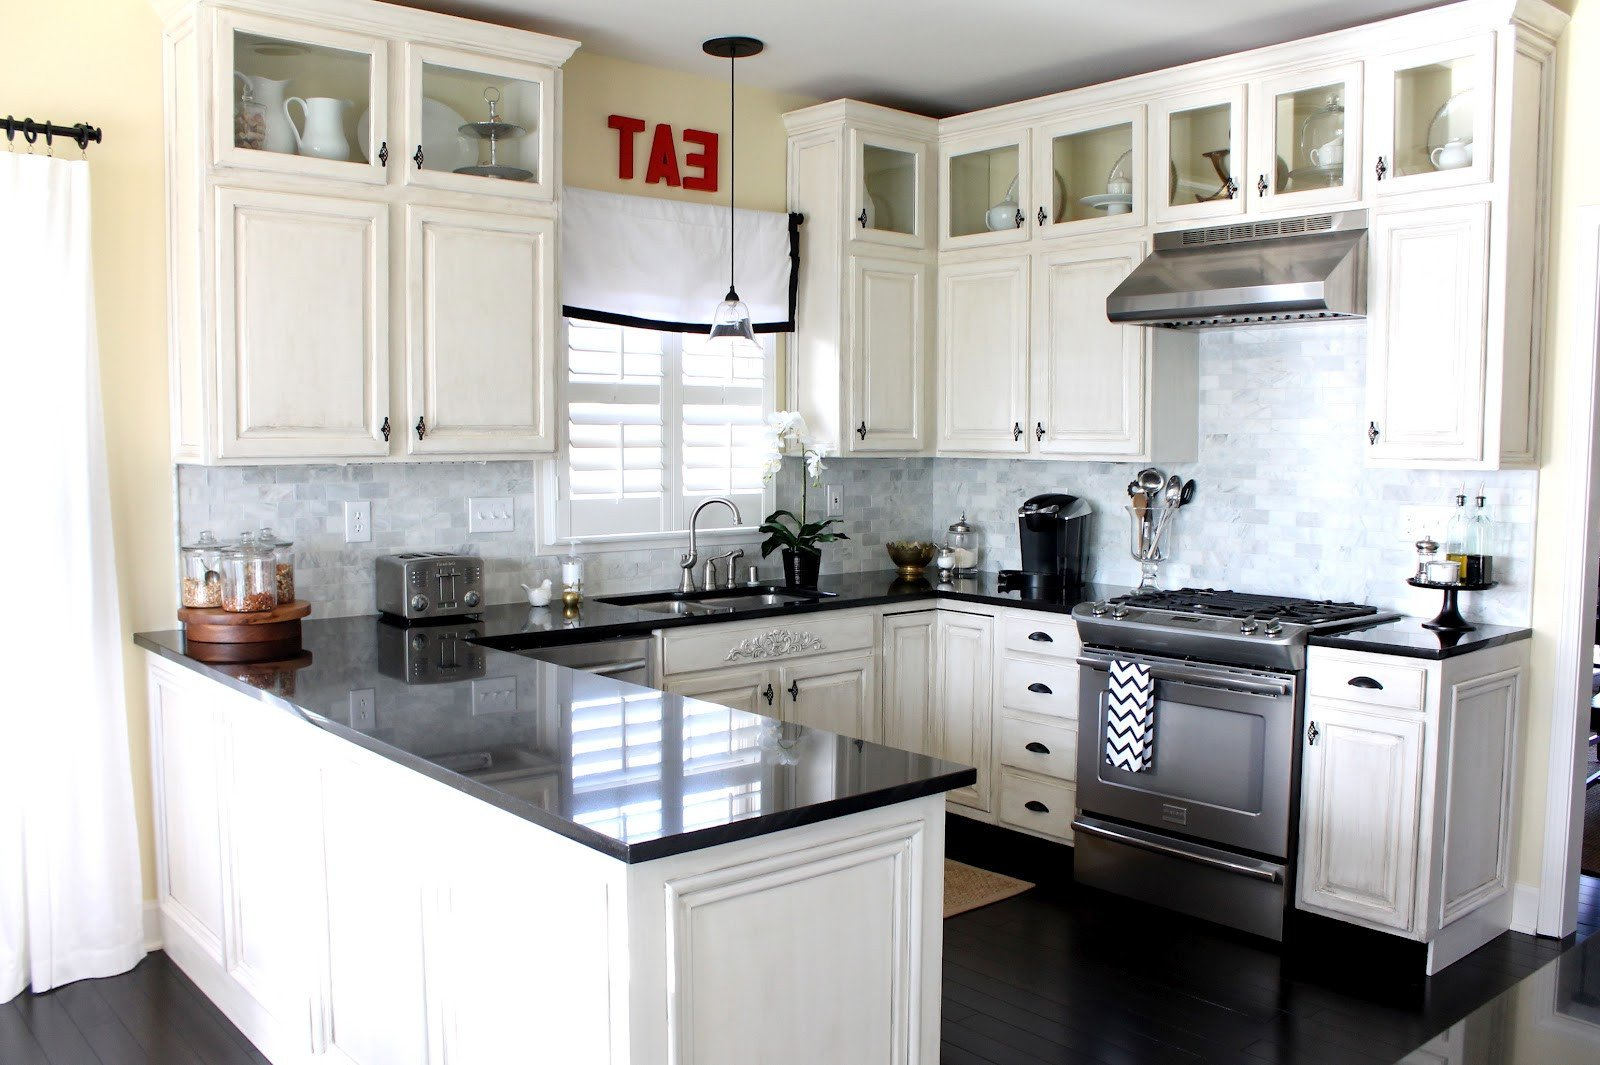 Kitchen Decor On A Budget Lovely Kitchen Design Ideas On A Bud Kitchen Design